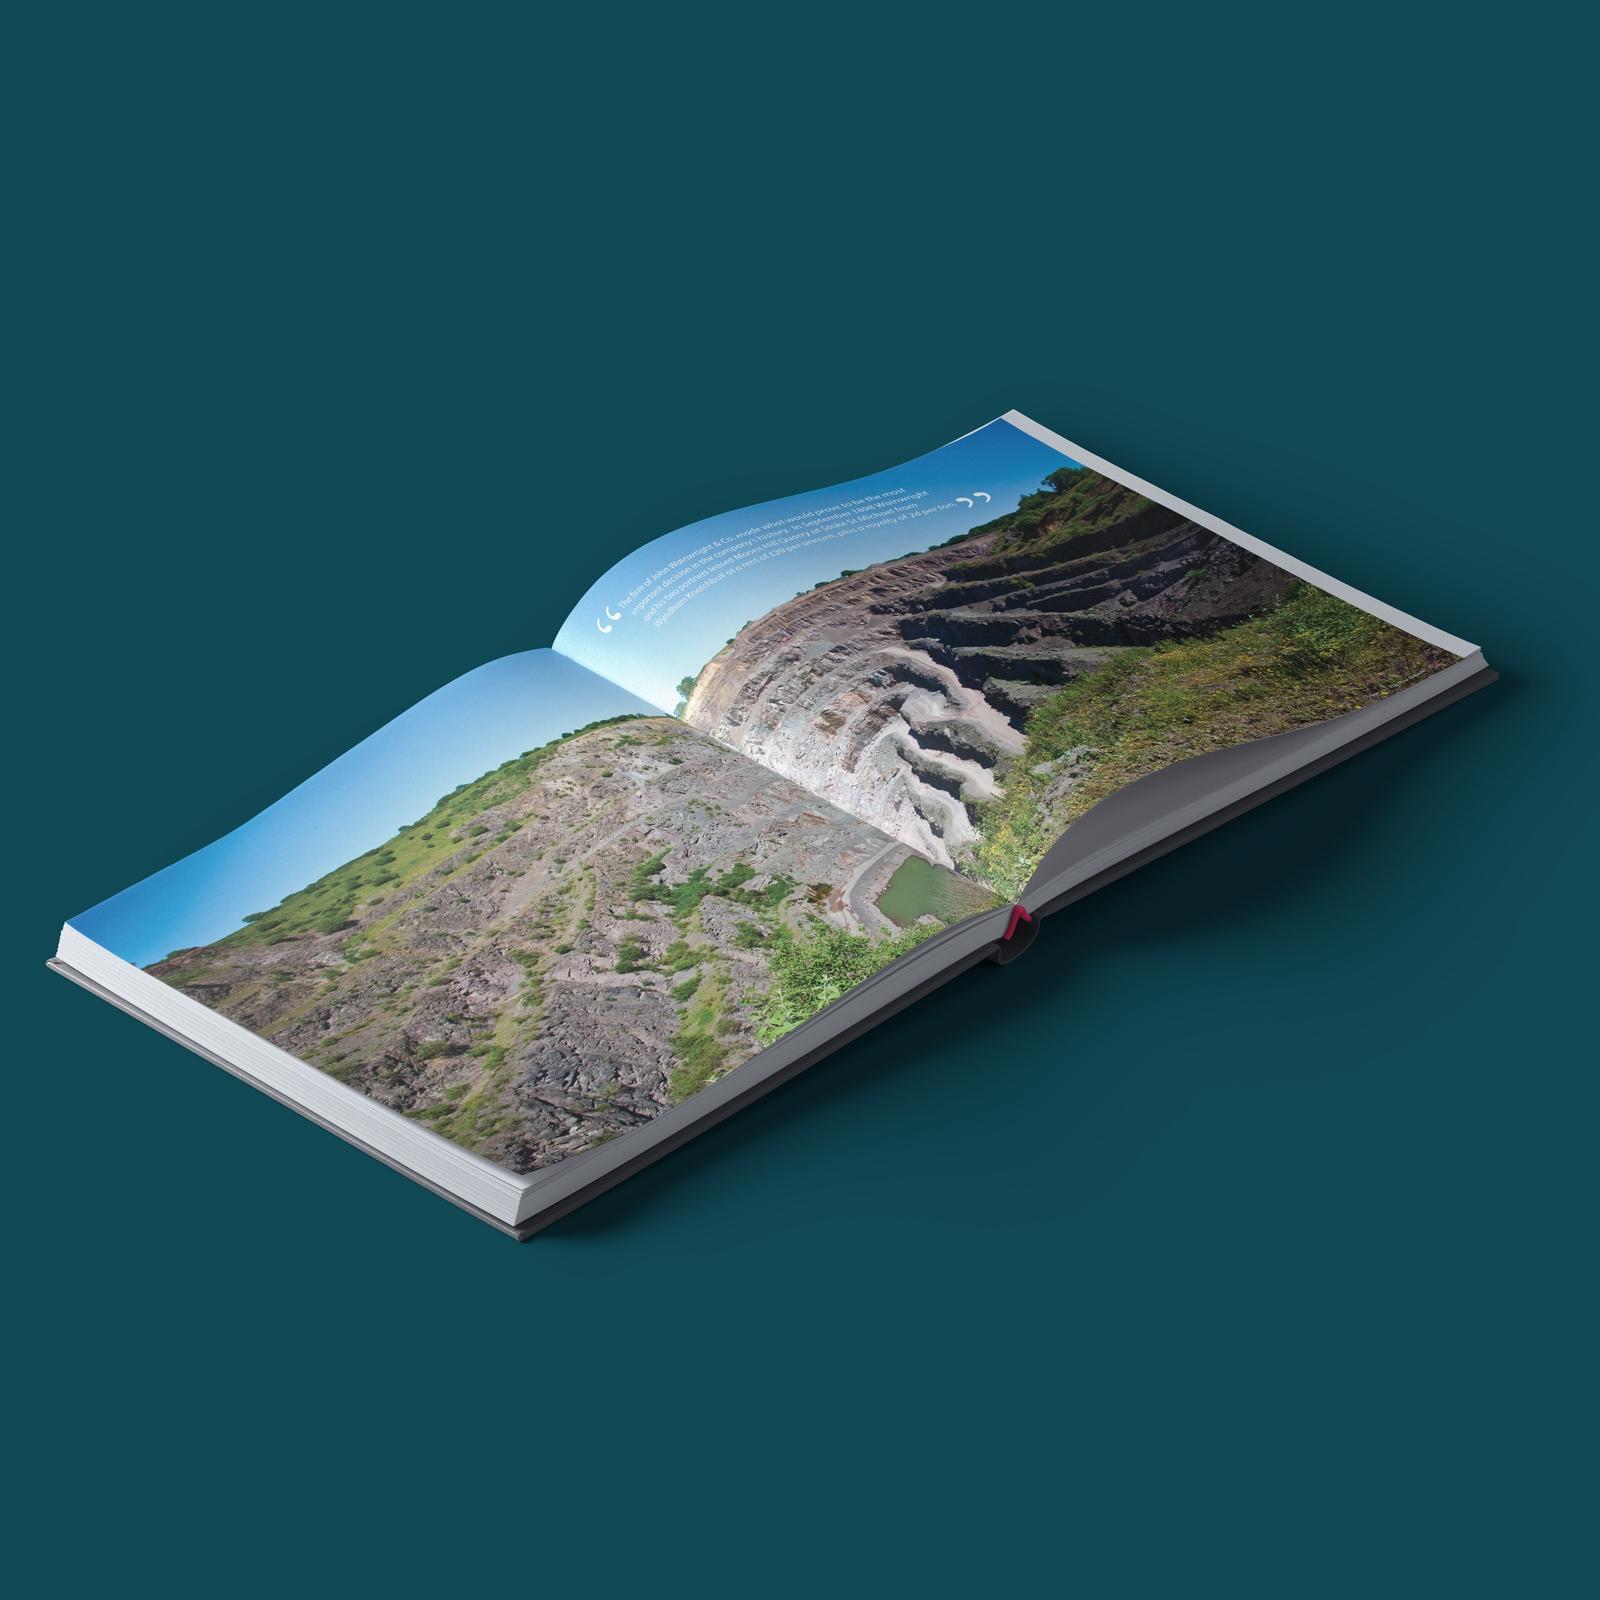 14-Wainwright-Quarry-Graphic-Design-Somerset-Photography-manufacturing-London.jpg